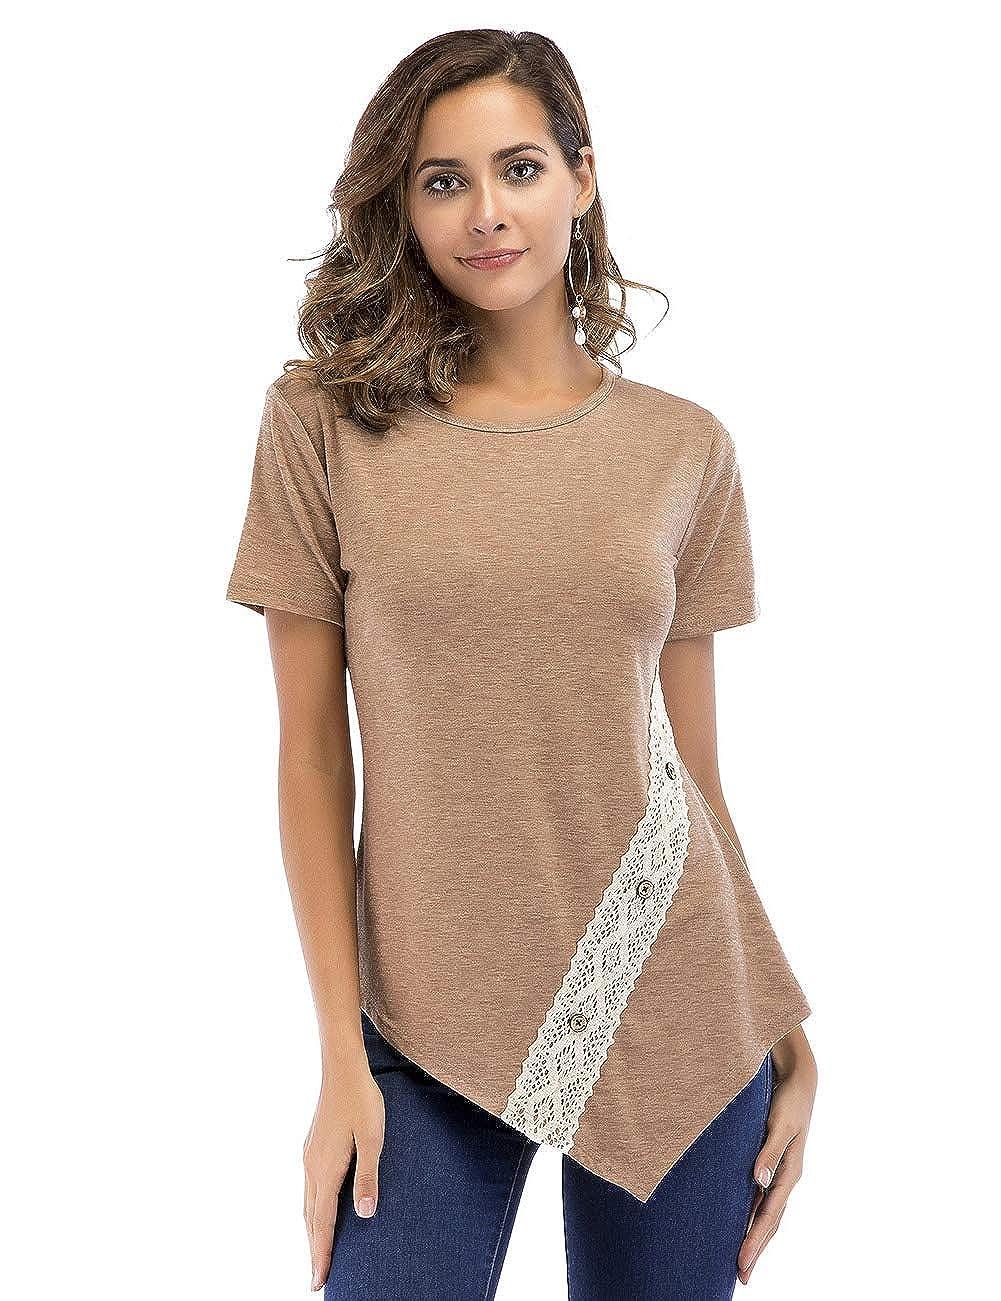 Brown YUMDO Women's Casual Short Sleeve Side Button T Shirt Blouse Tunics